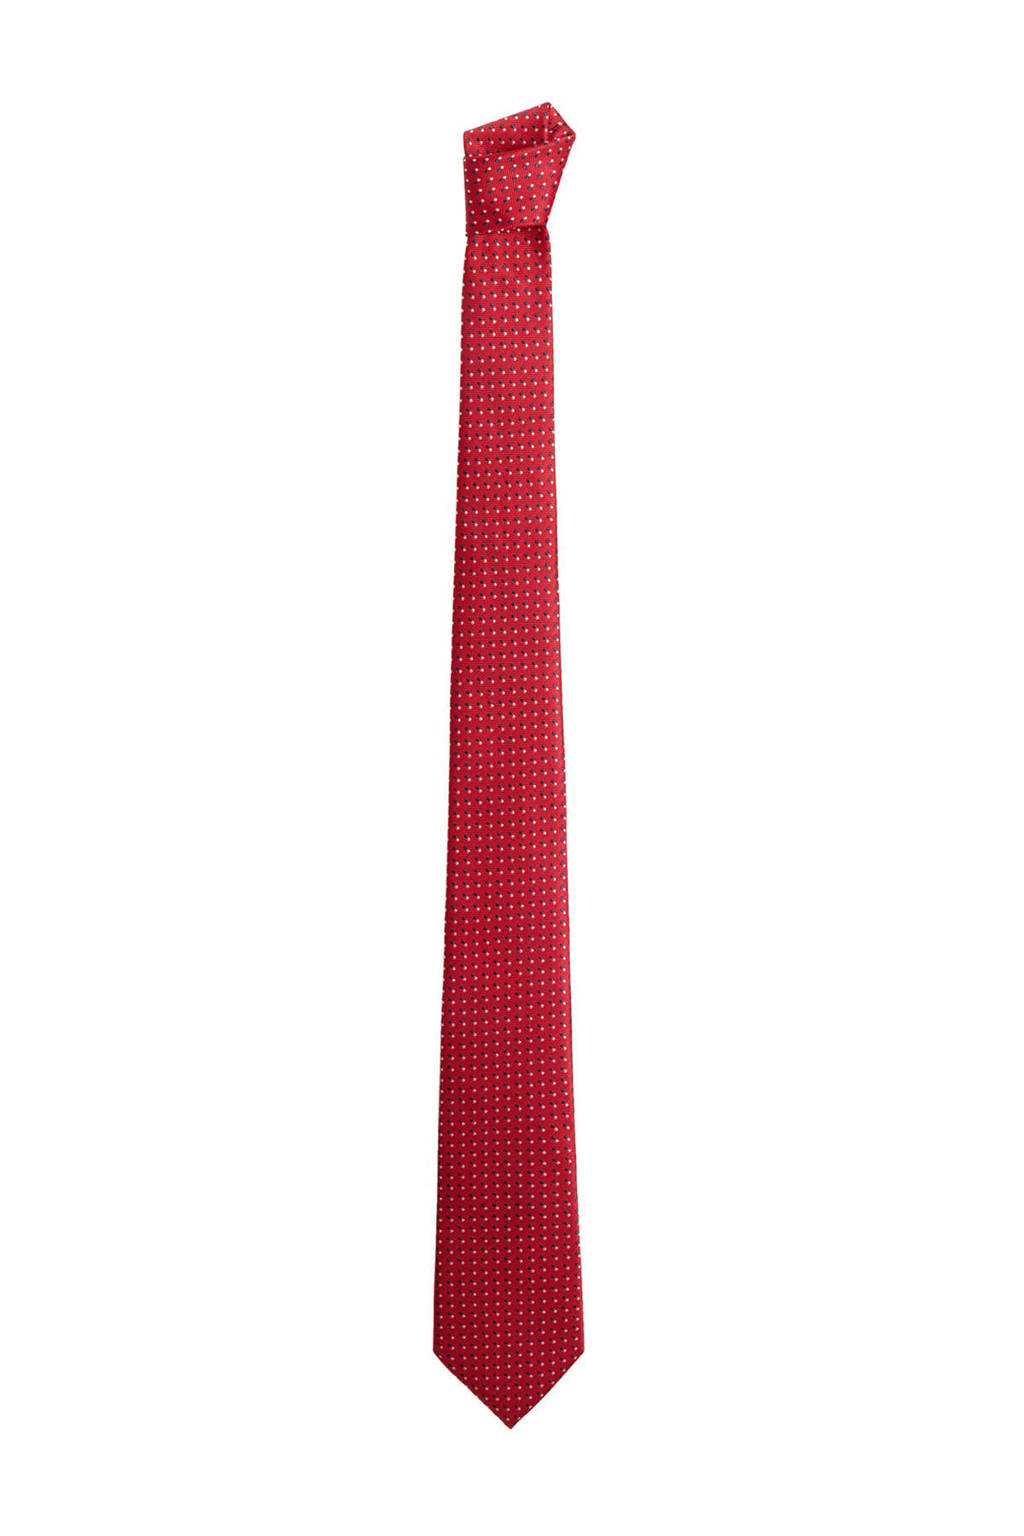 Mango Man stropdas rood, Rood